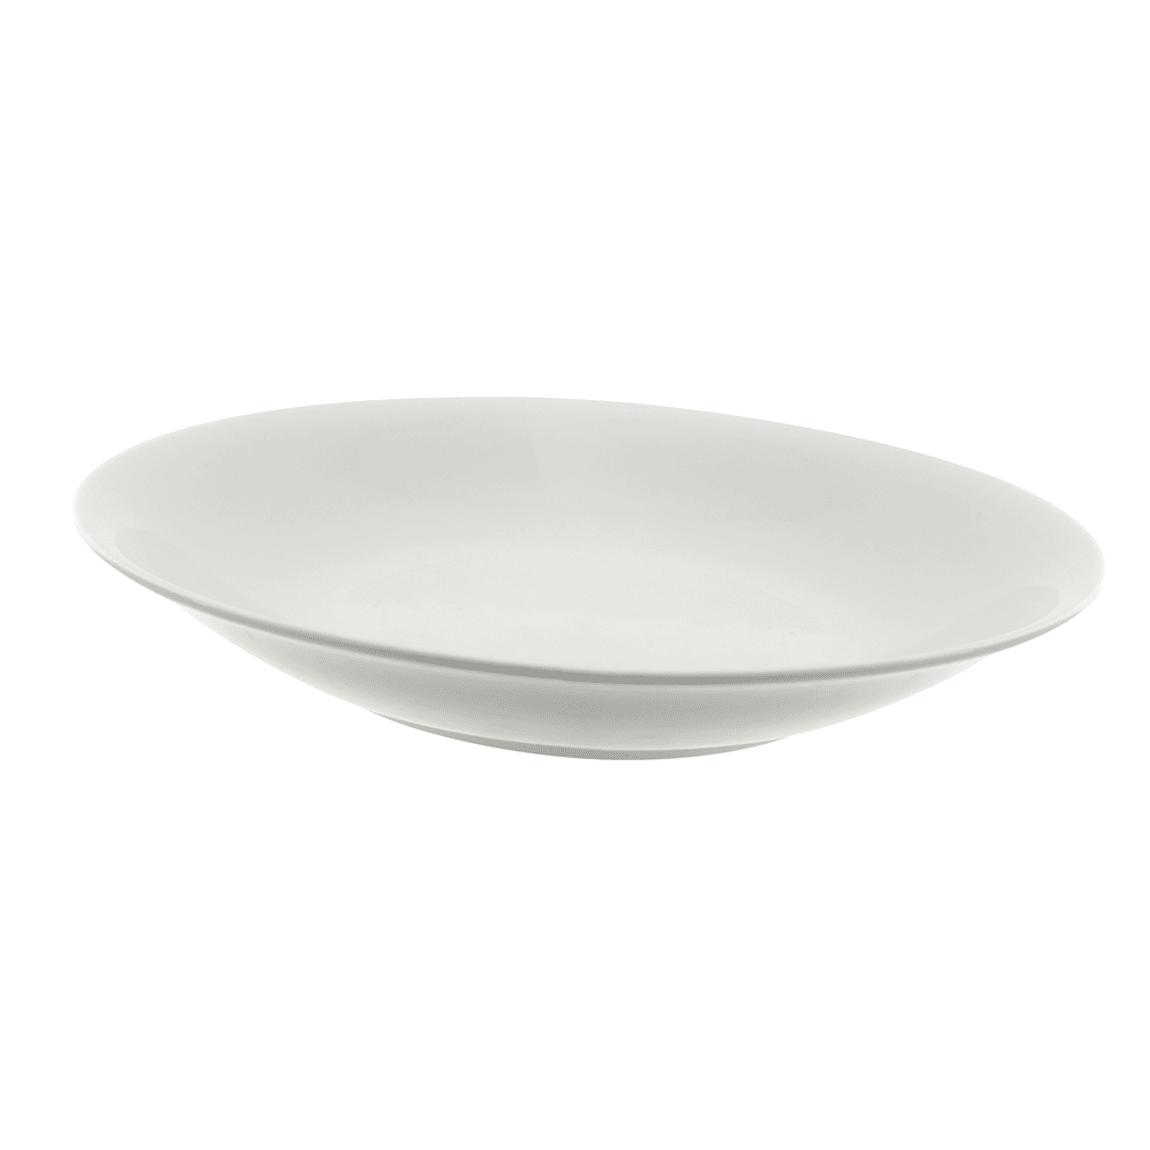 10 Strawberry Street WTR-12CPBWL 36 oz Round Bowl - Porcelain, White